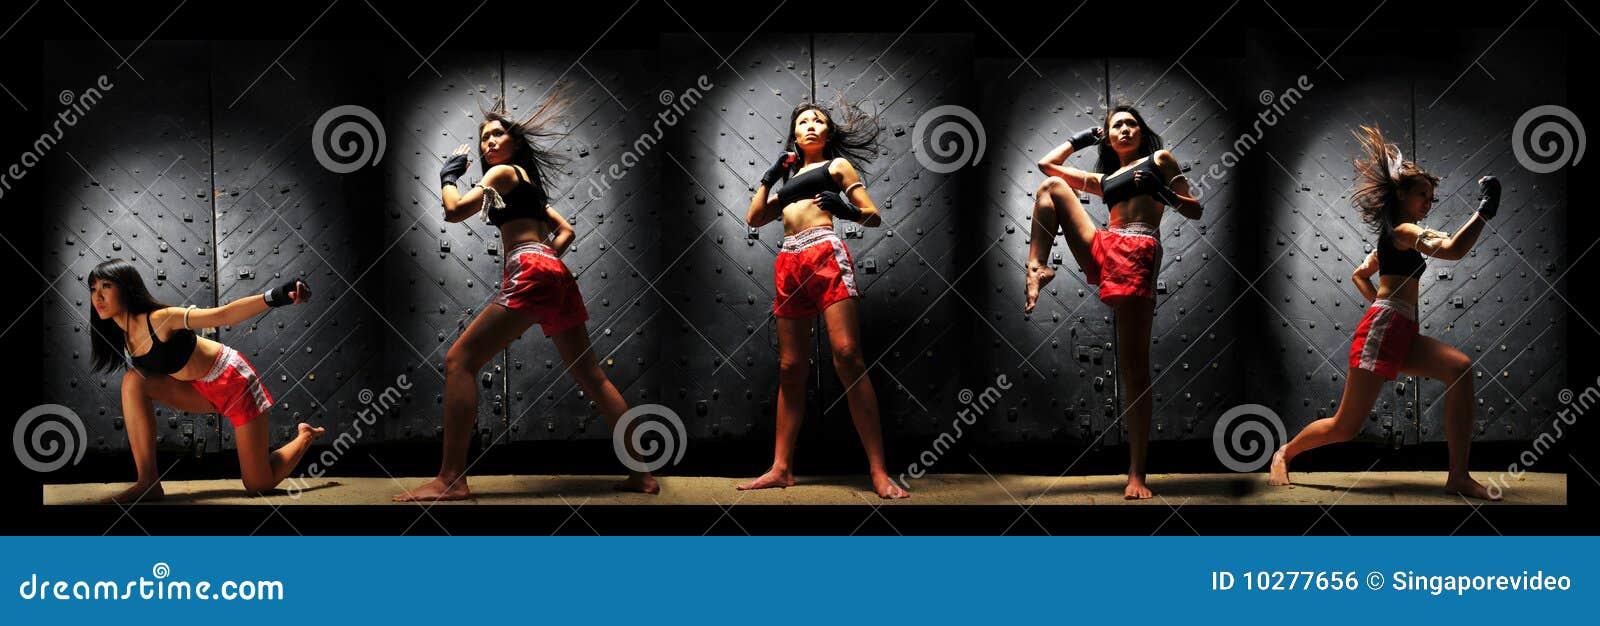 Asian Woman Practising Muay Thai Boxing